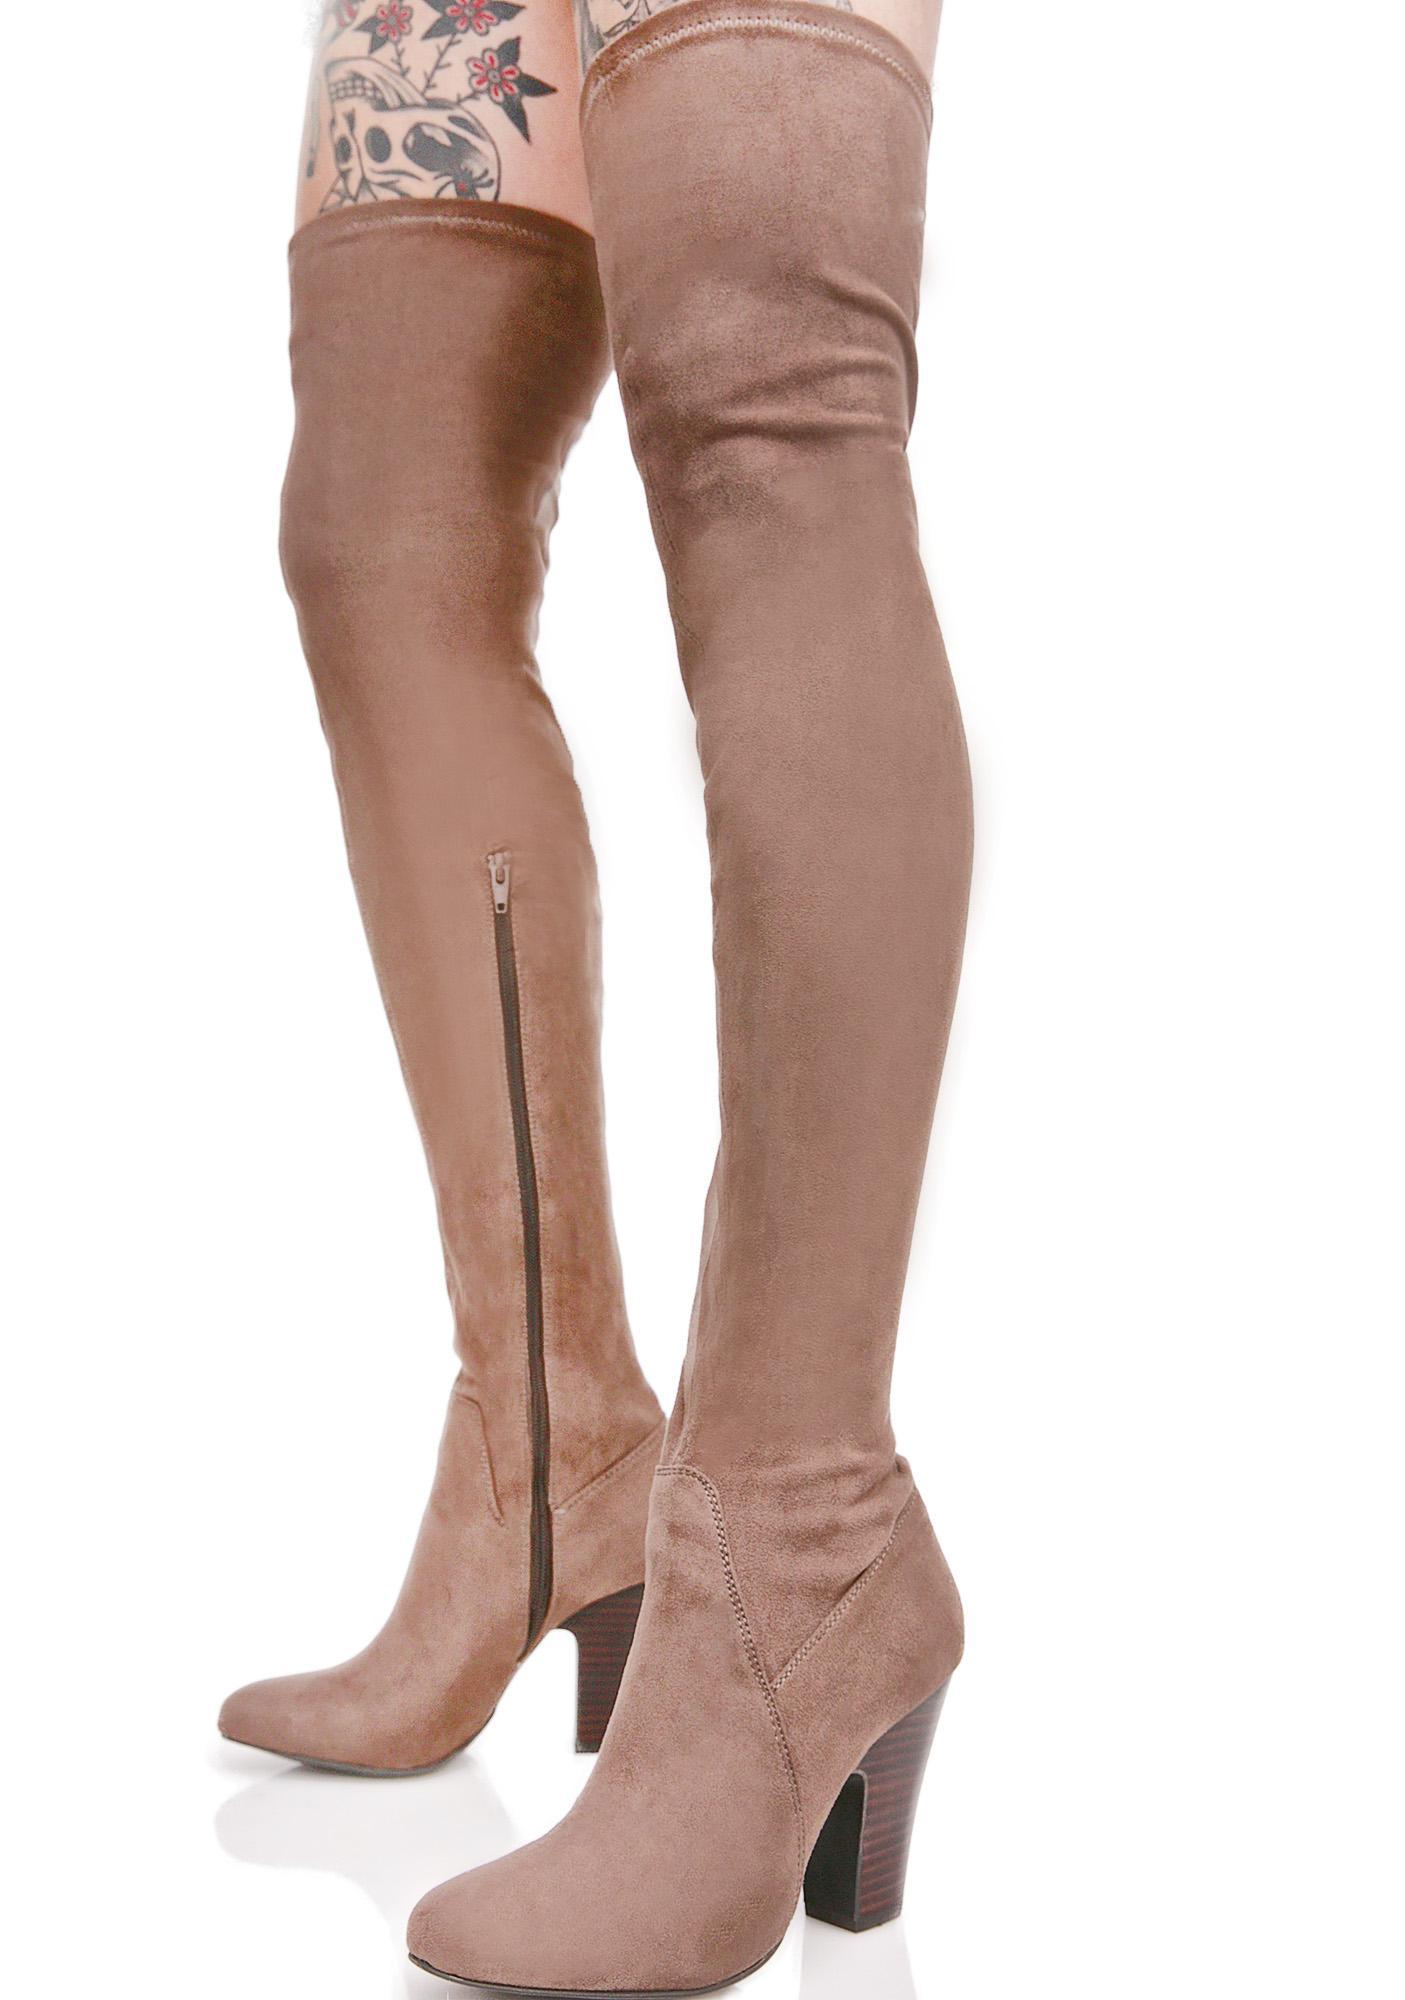 Solar Thigh-High Boots